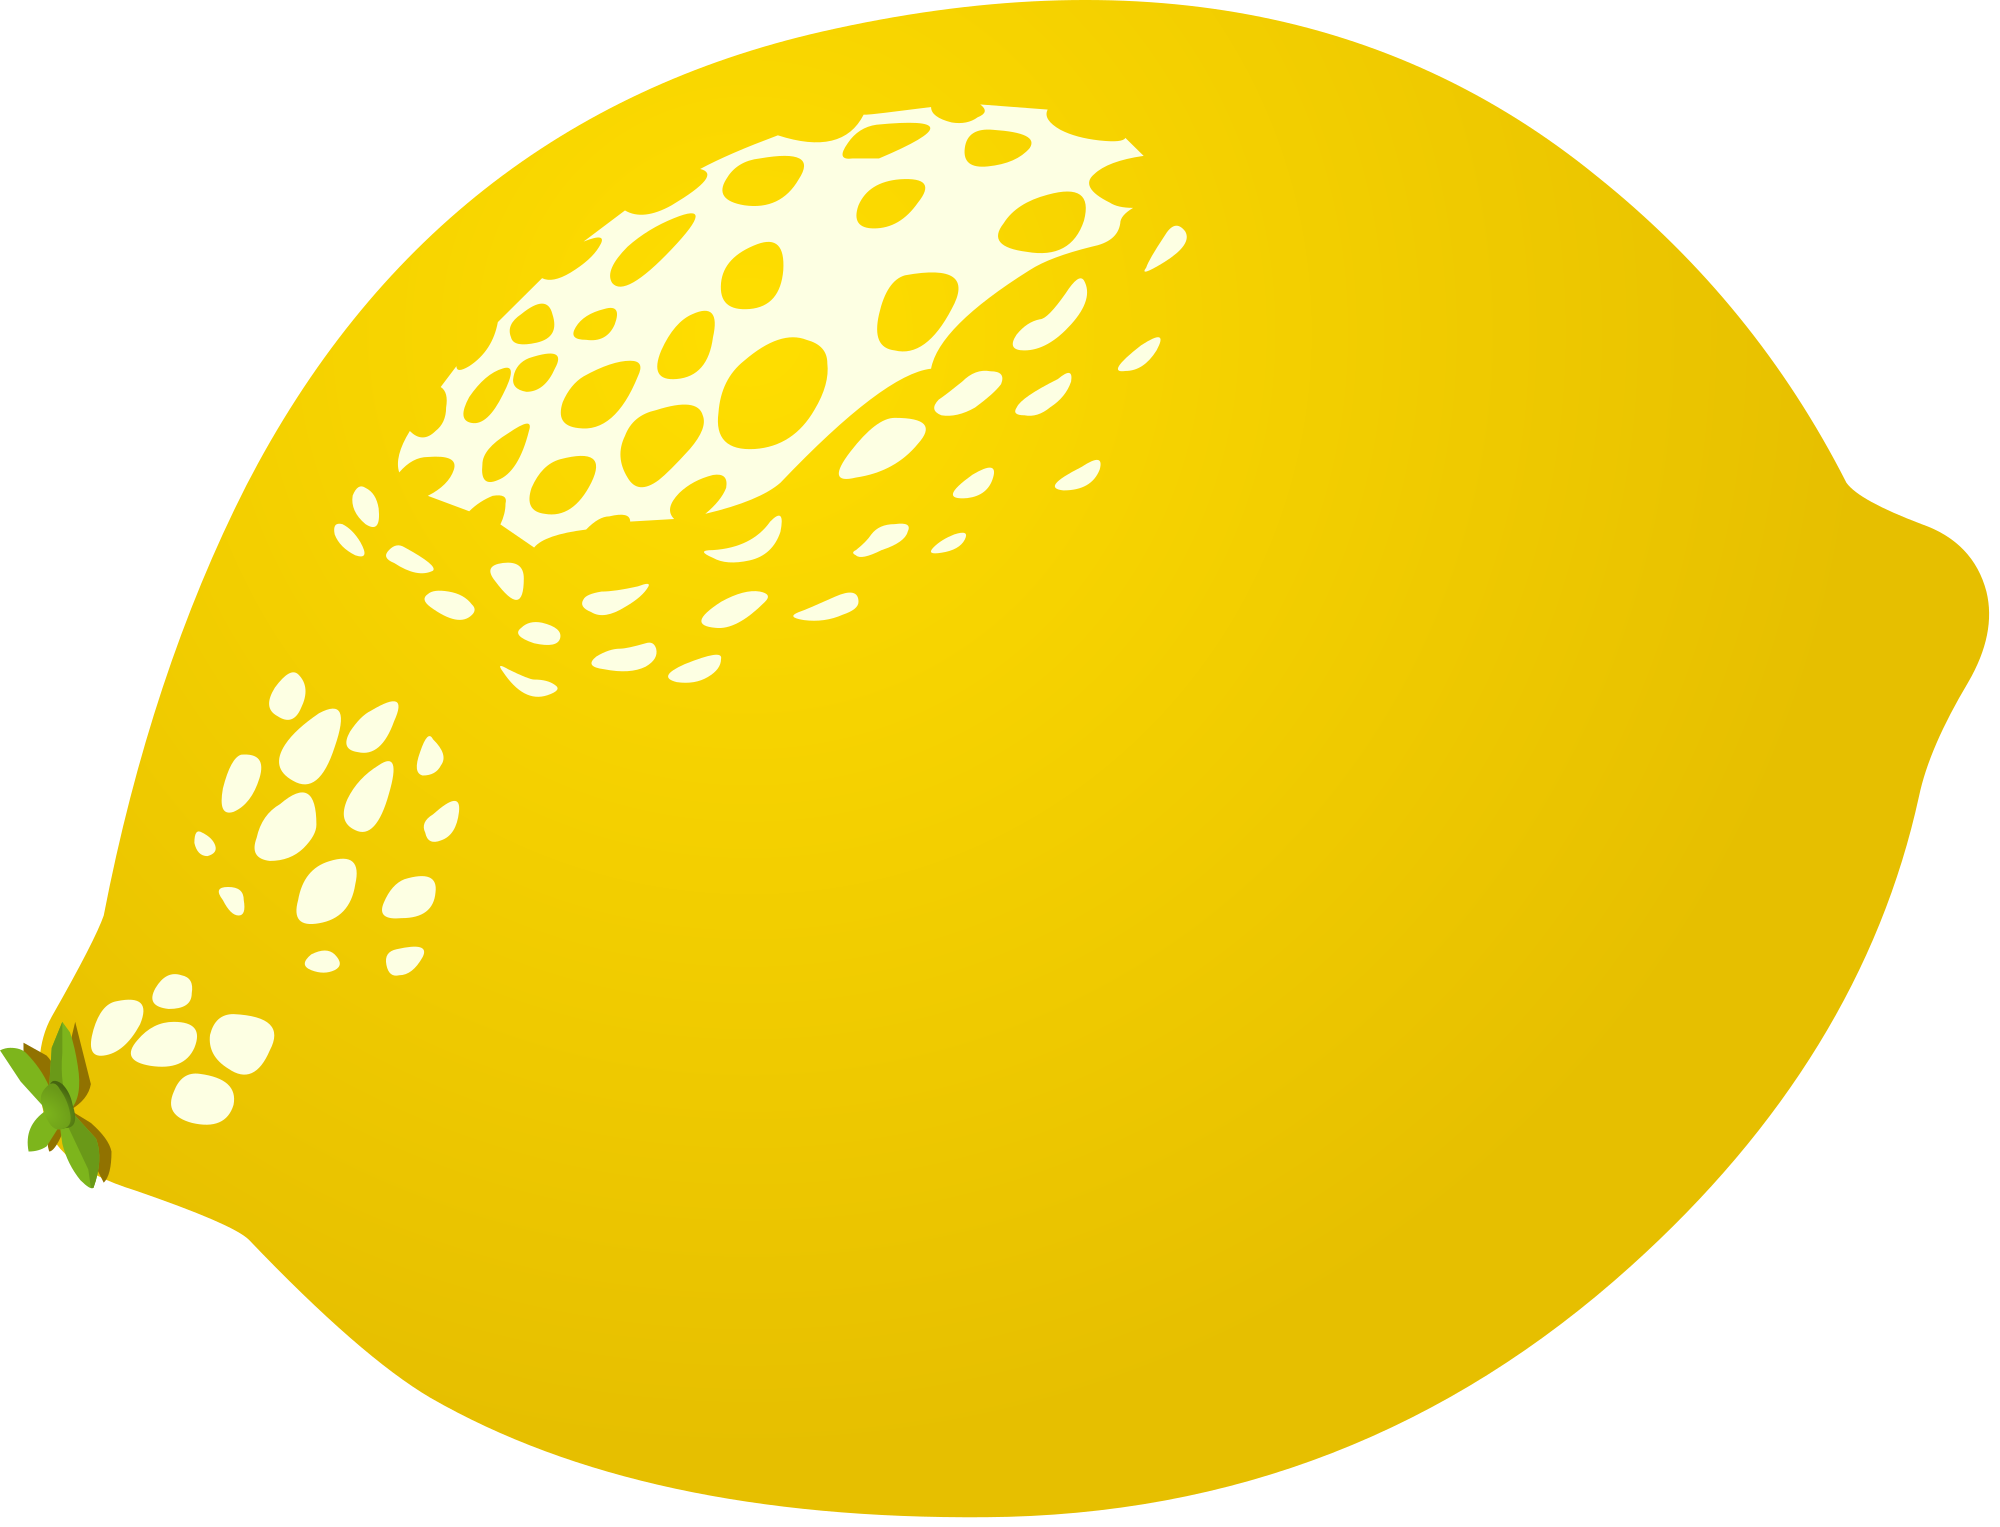 Pin by Charudeal on Clipart Lemon clipart, Clip art, Lemon